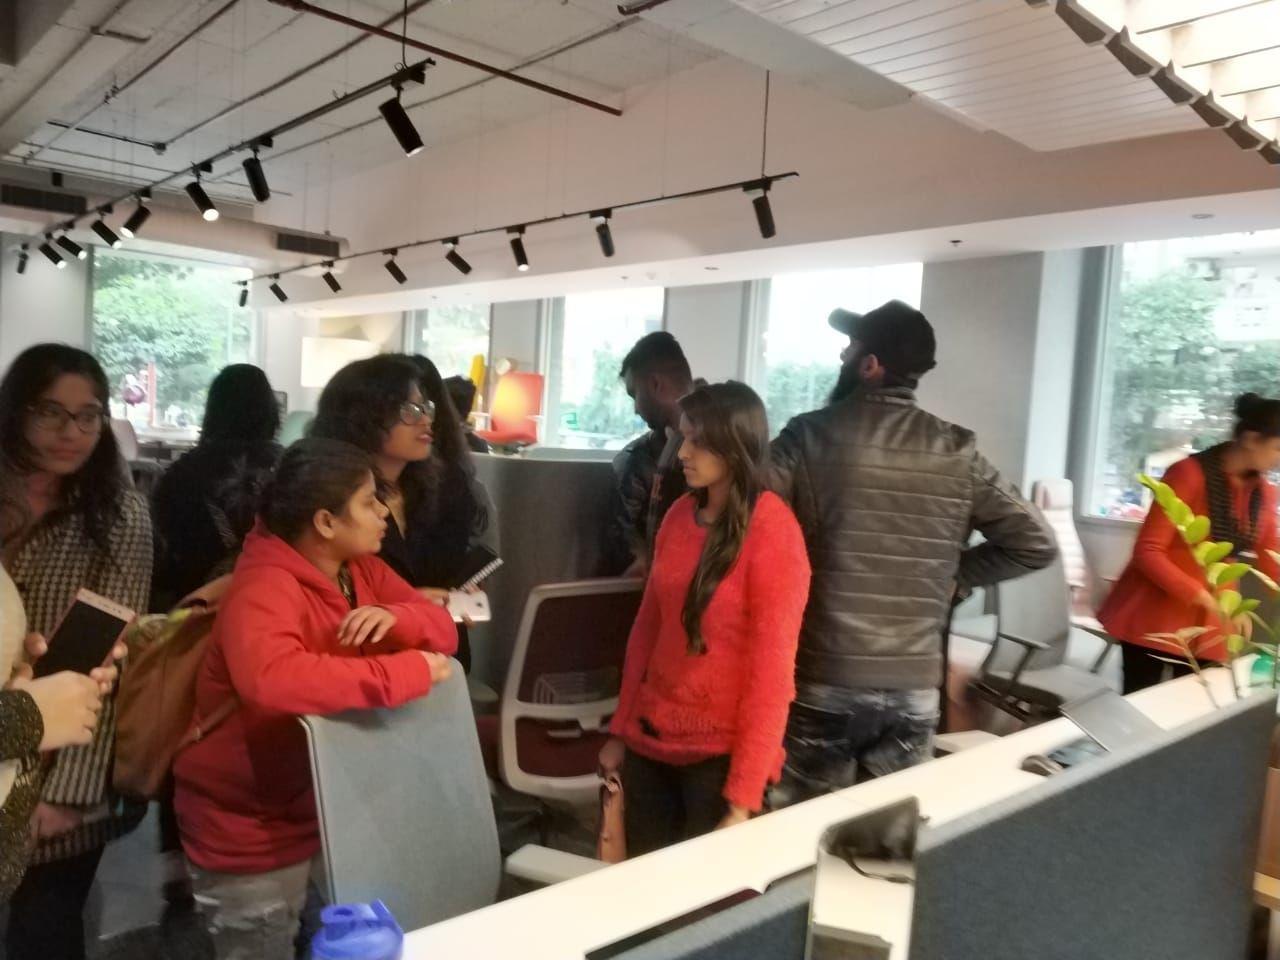 Students Of Ivs School Of Design Noida Went For Visit Of Haworth Showroom Ivs Creativ Interior Design Colleges Interior Design Institute Interior Design